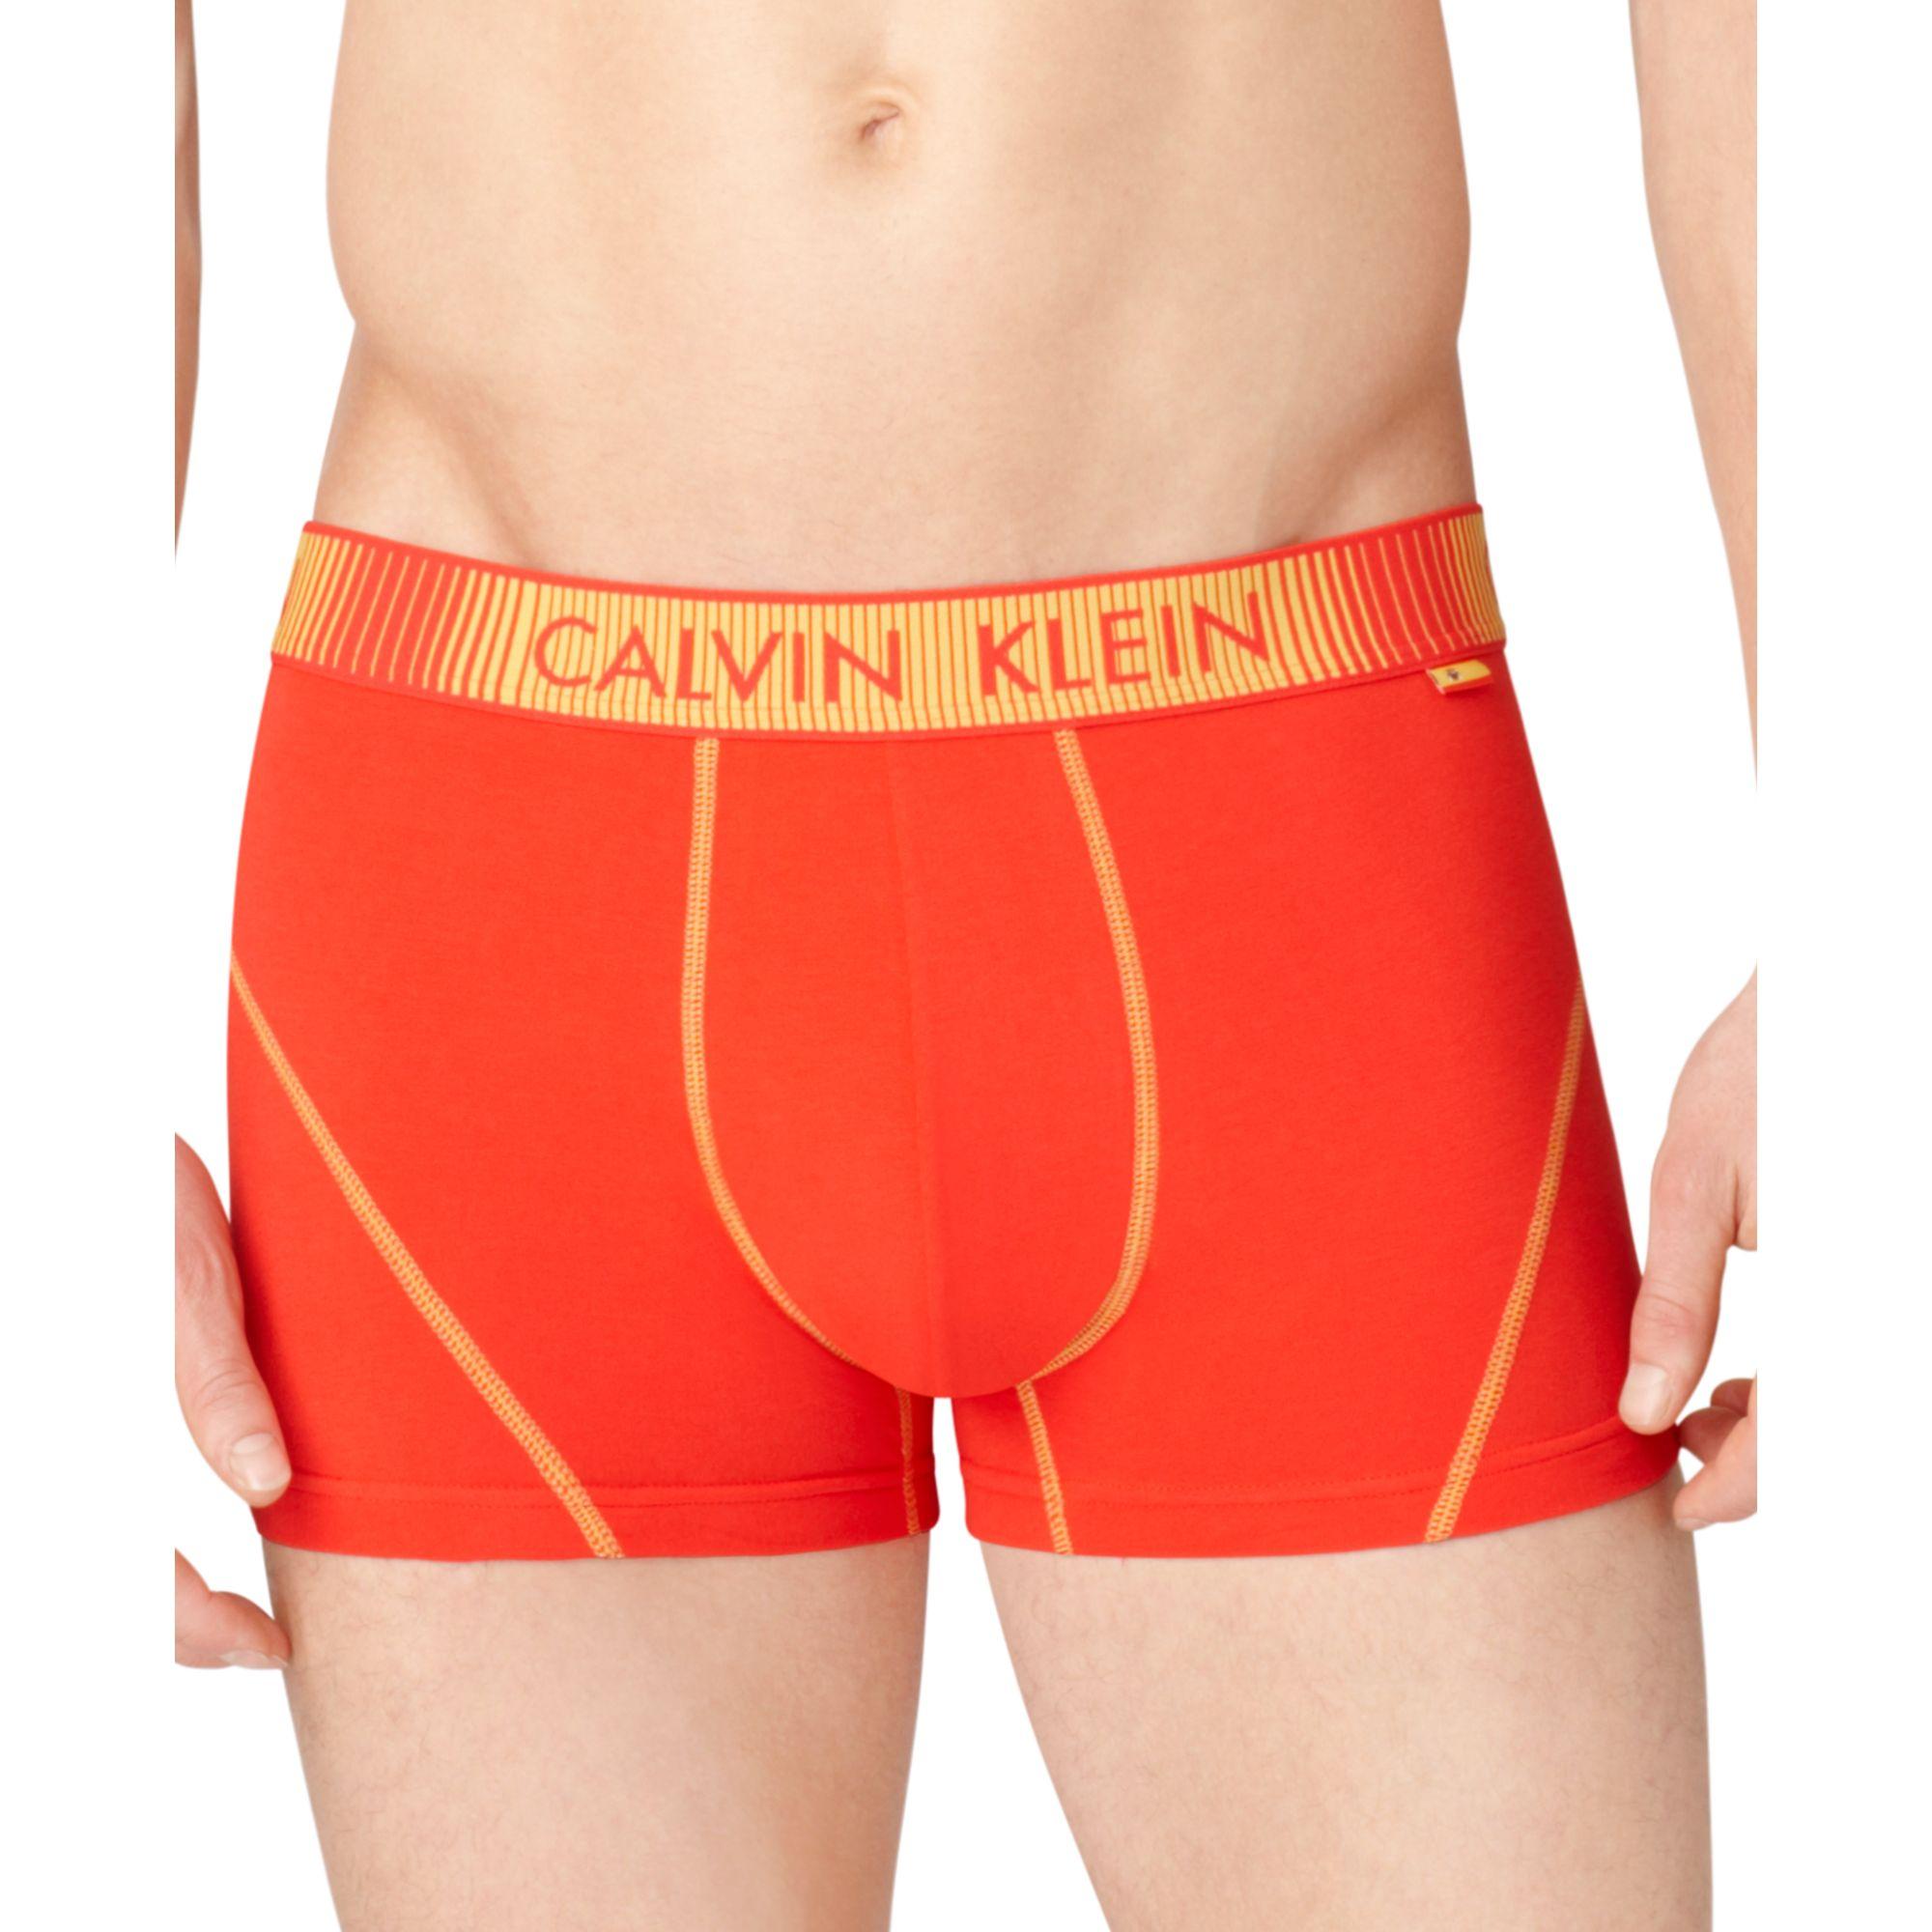 calvin klein mens global sport limited edition trunk in. Black Bedroom Furniture Sets. Home Design Ideas